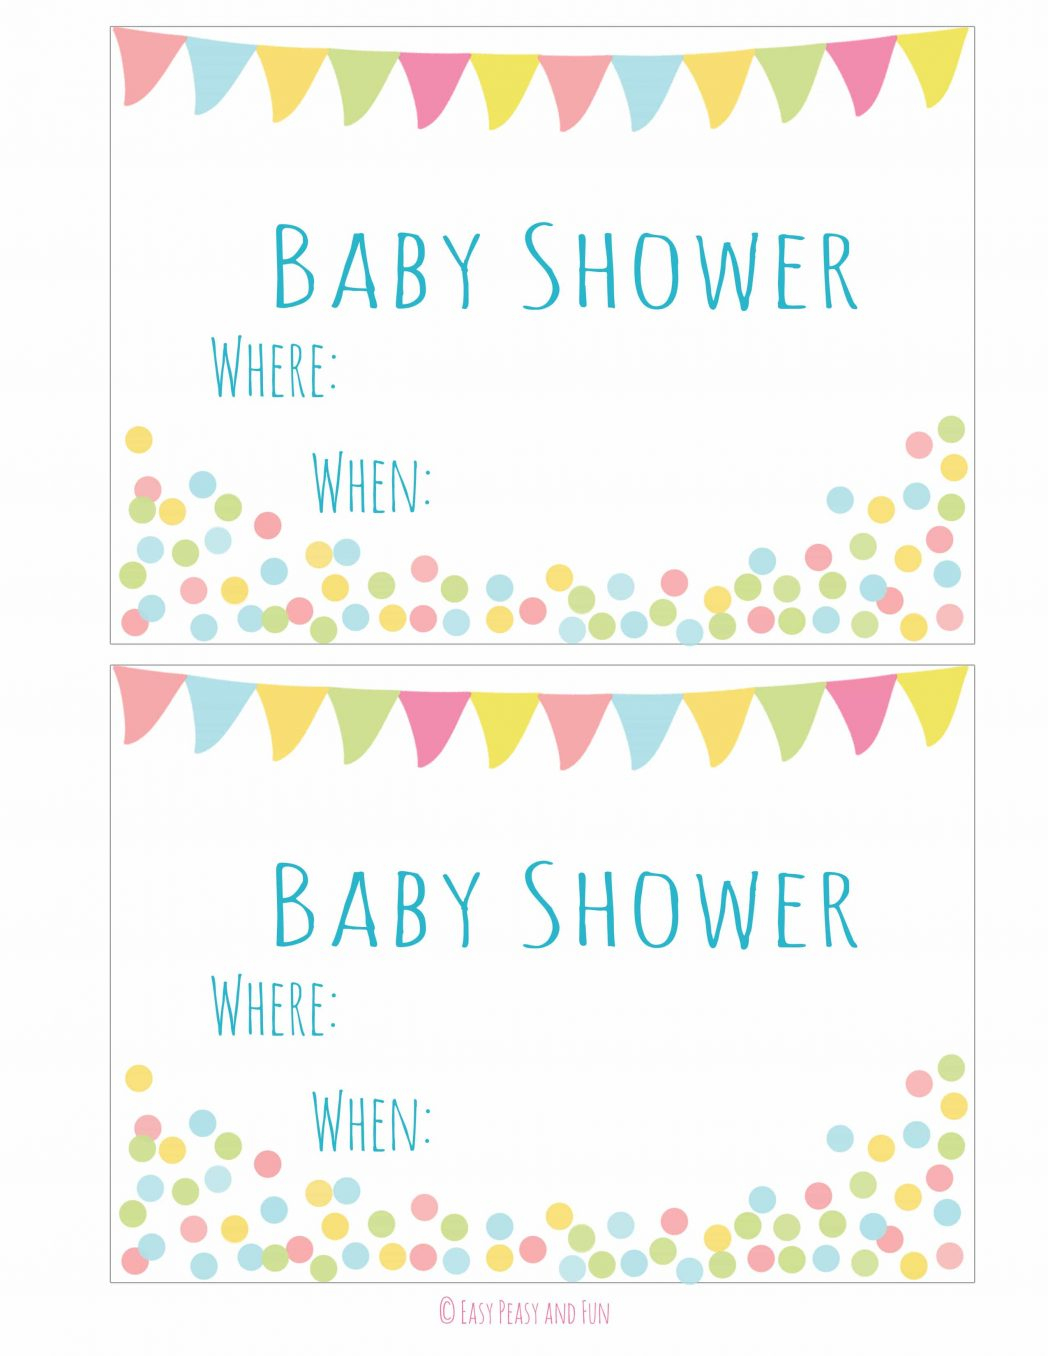 Free Printable Baby Shower Invitation Easy Peasy And Fun Blue - Free Printable Baby Shower Invitation Maker